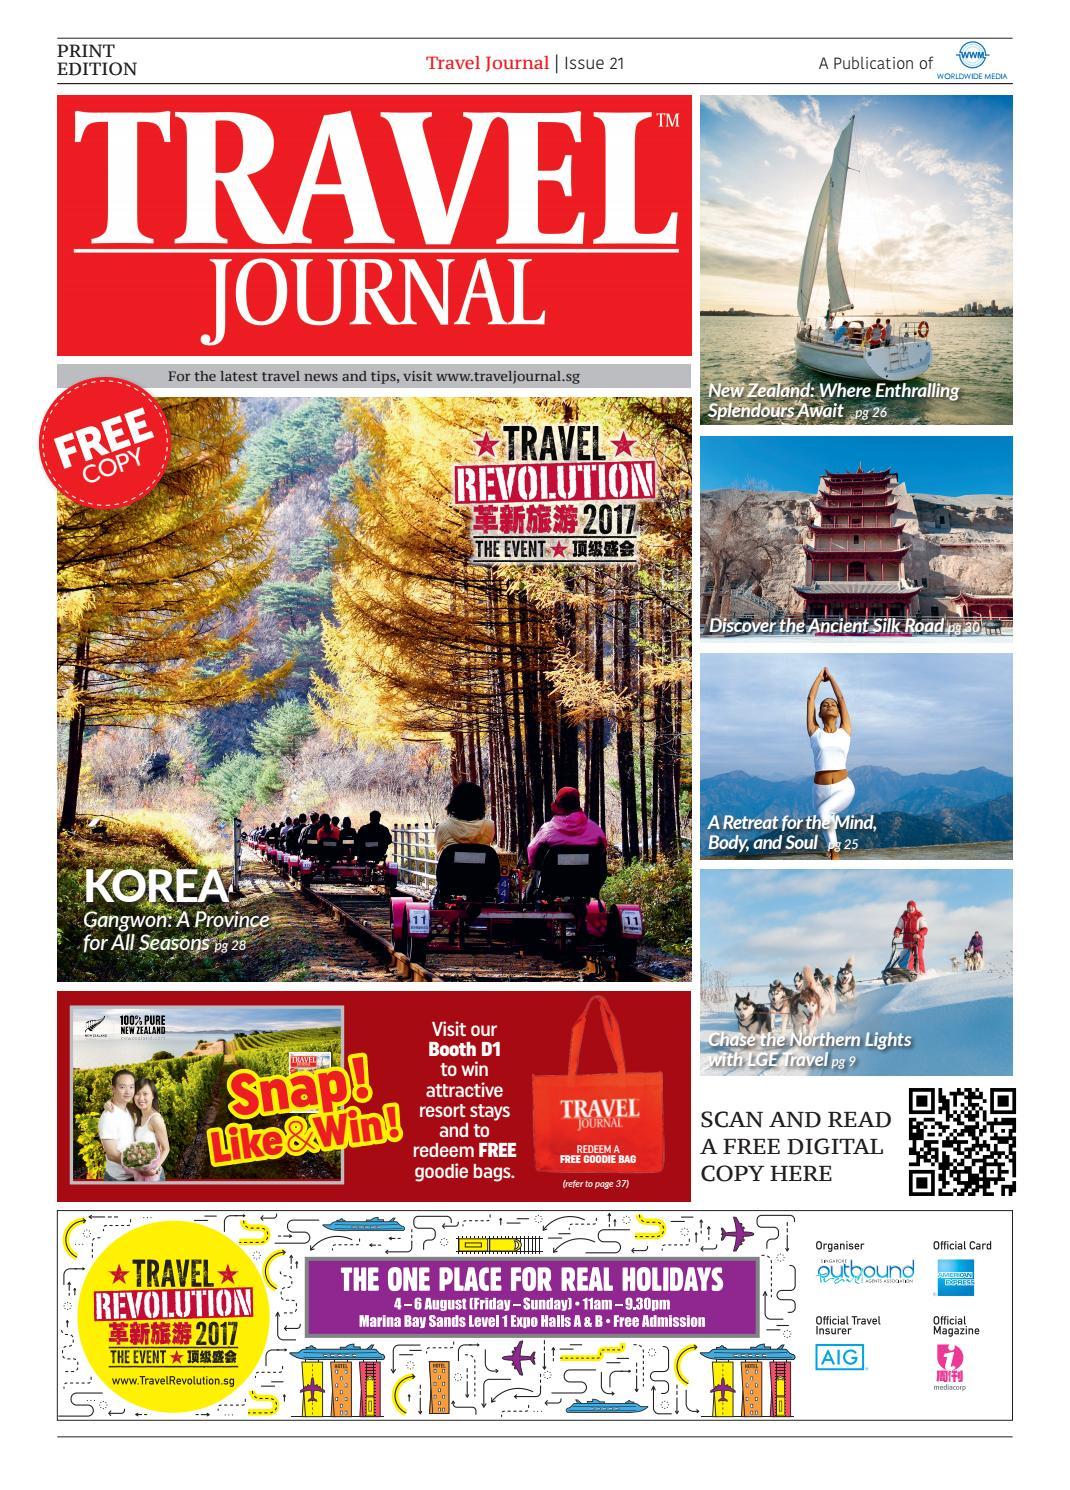 Travel Journal July 2017 By Wwmsg Issuu 4d3n Bangkok Pattaya Include Nanta Show